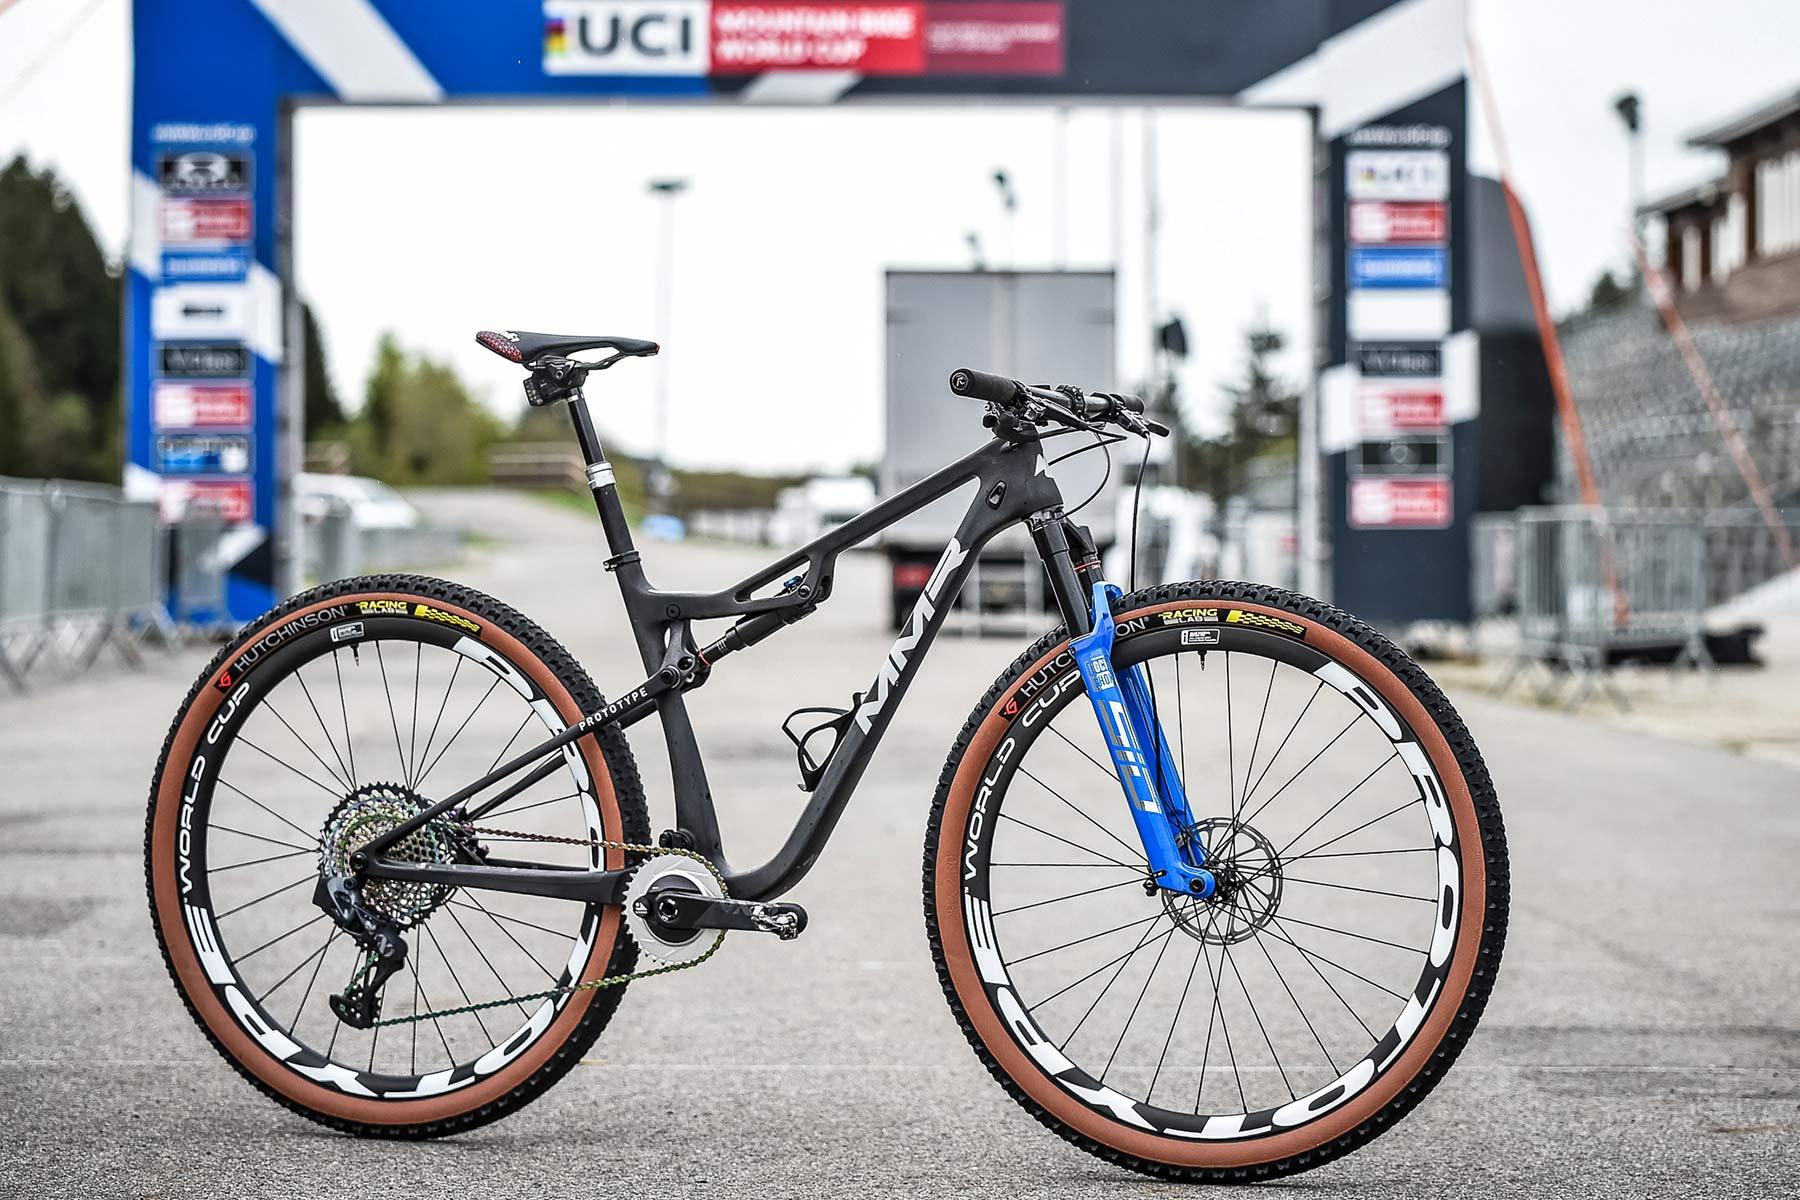 2021 MMR Kenta 29 prototype XC race bike, 100mm full-suspension carbon cross-country mountain bike, complete